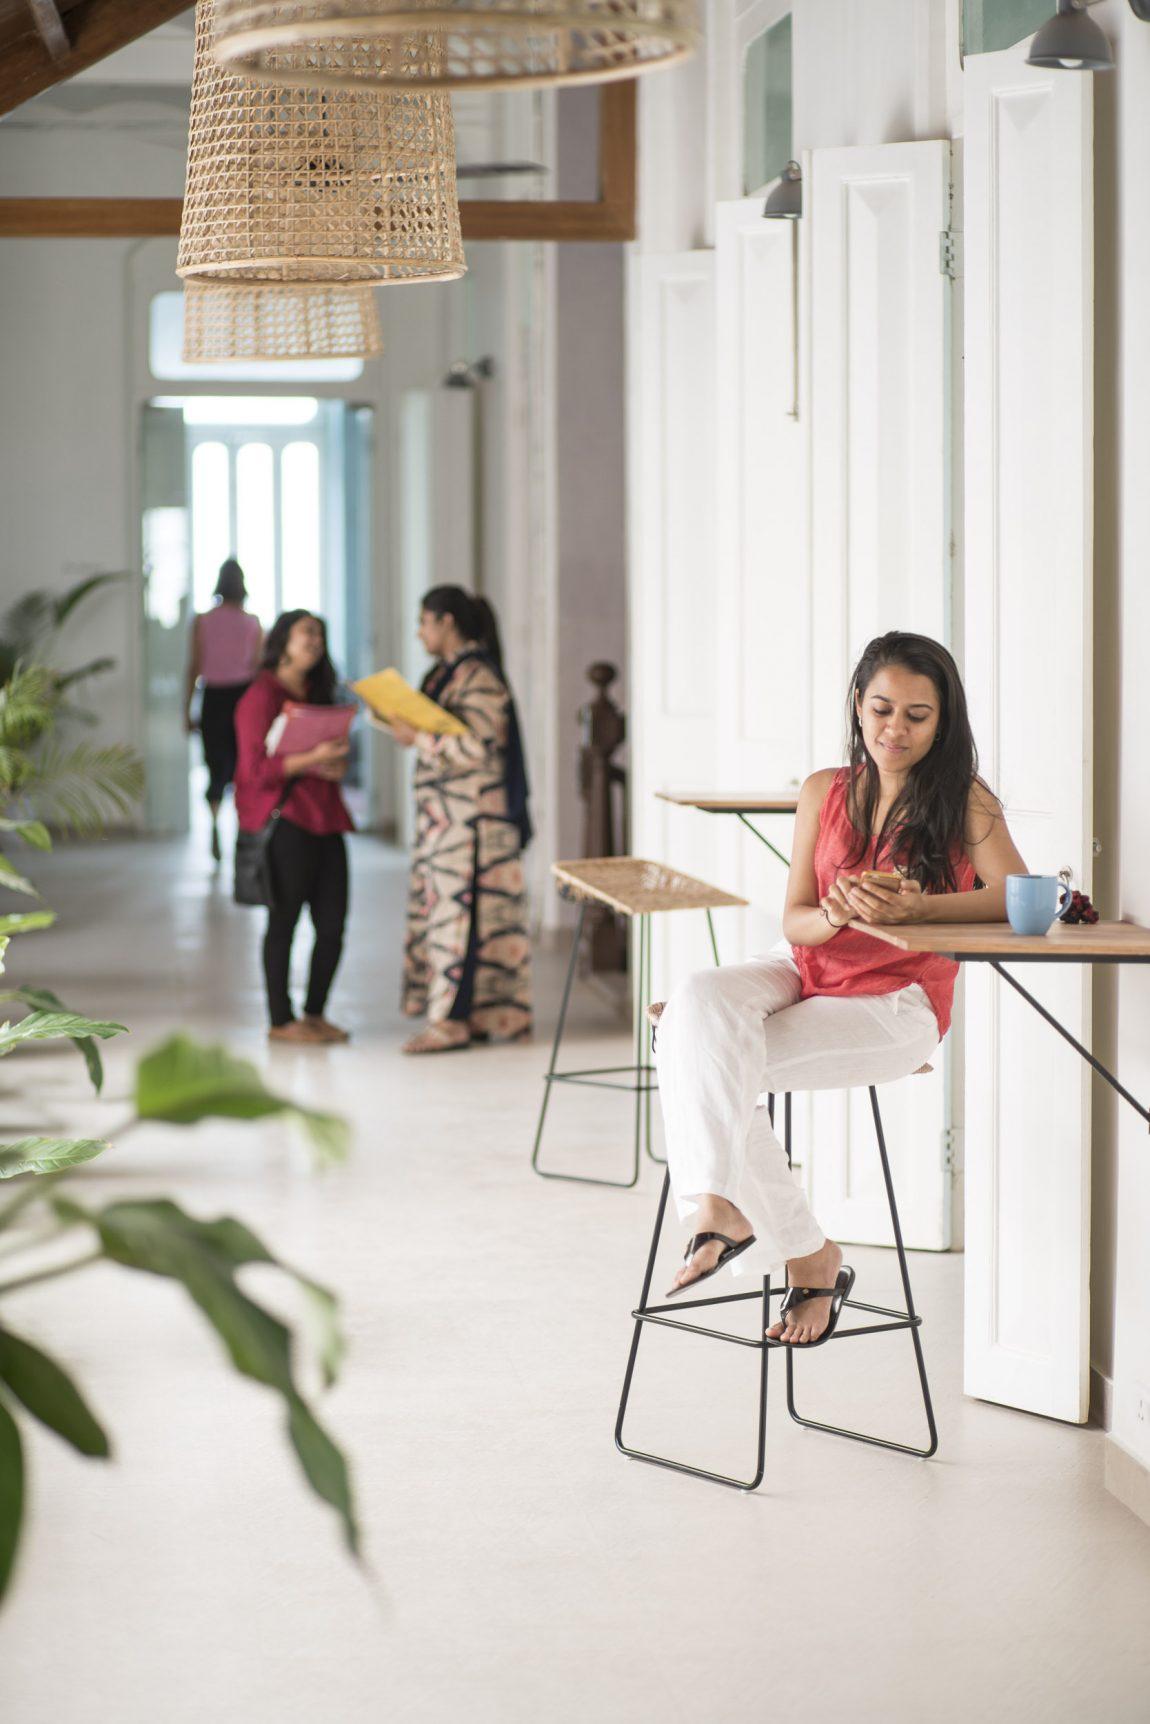 flexwerkplek-mumbai-inspiratie